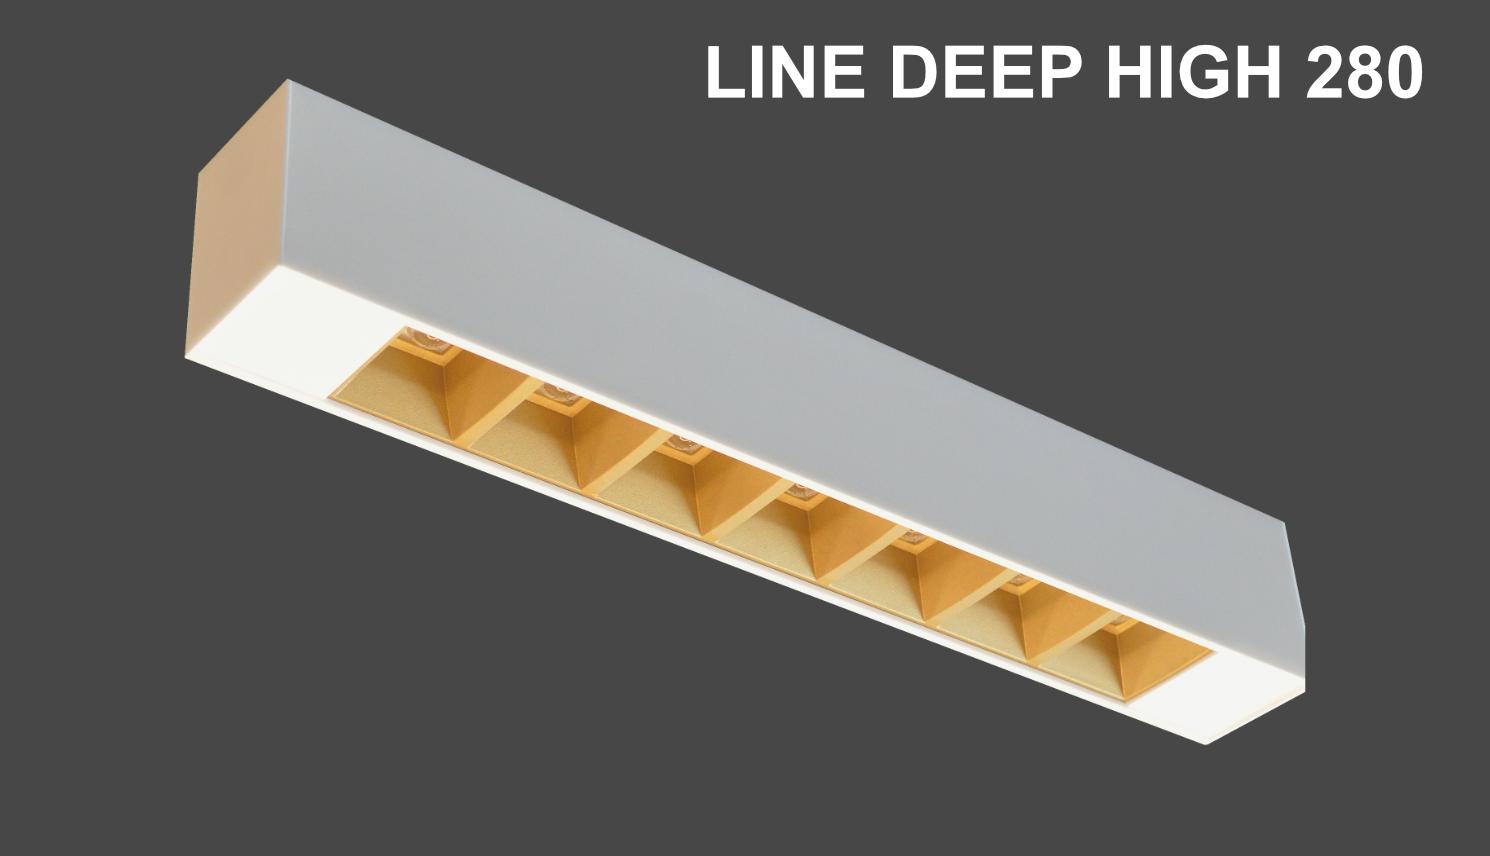 LINE DEEP HIGH 280